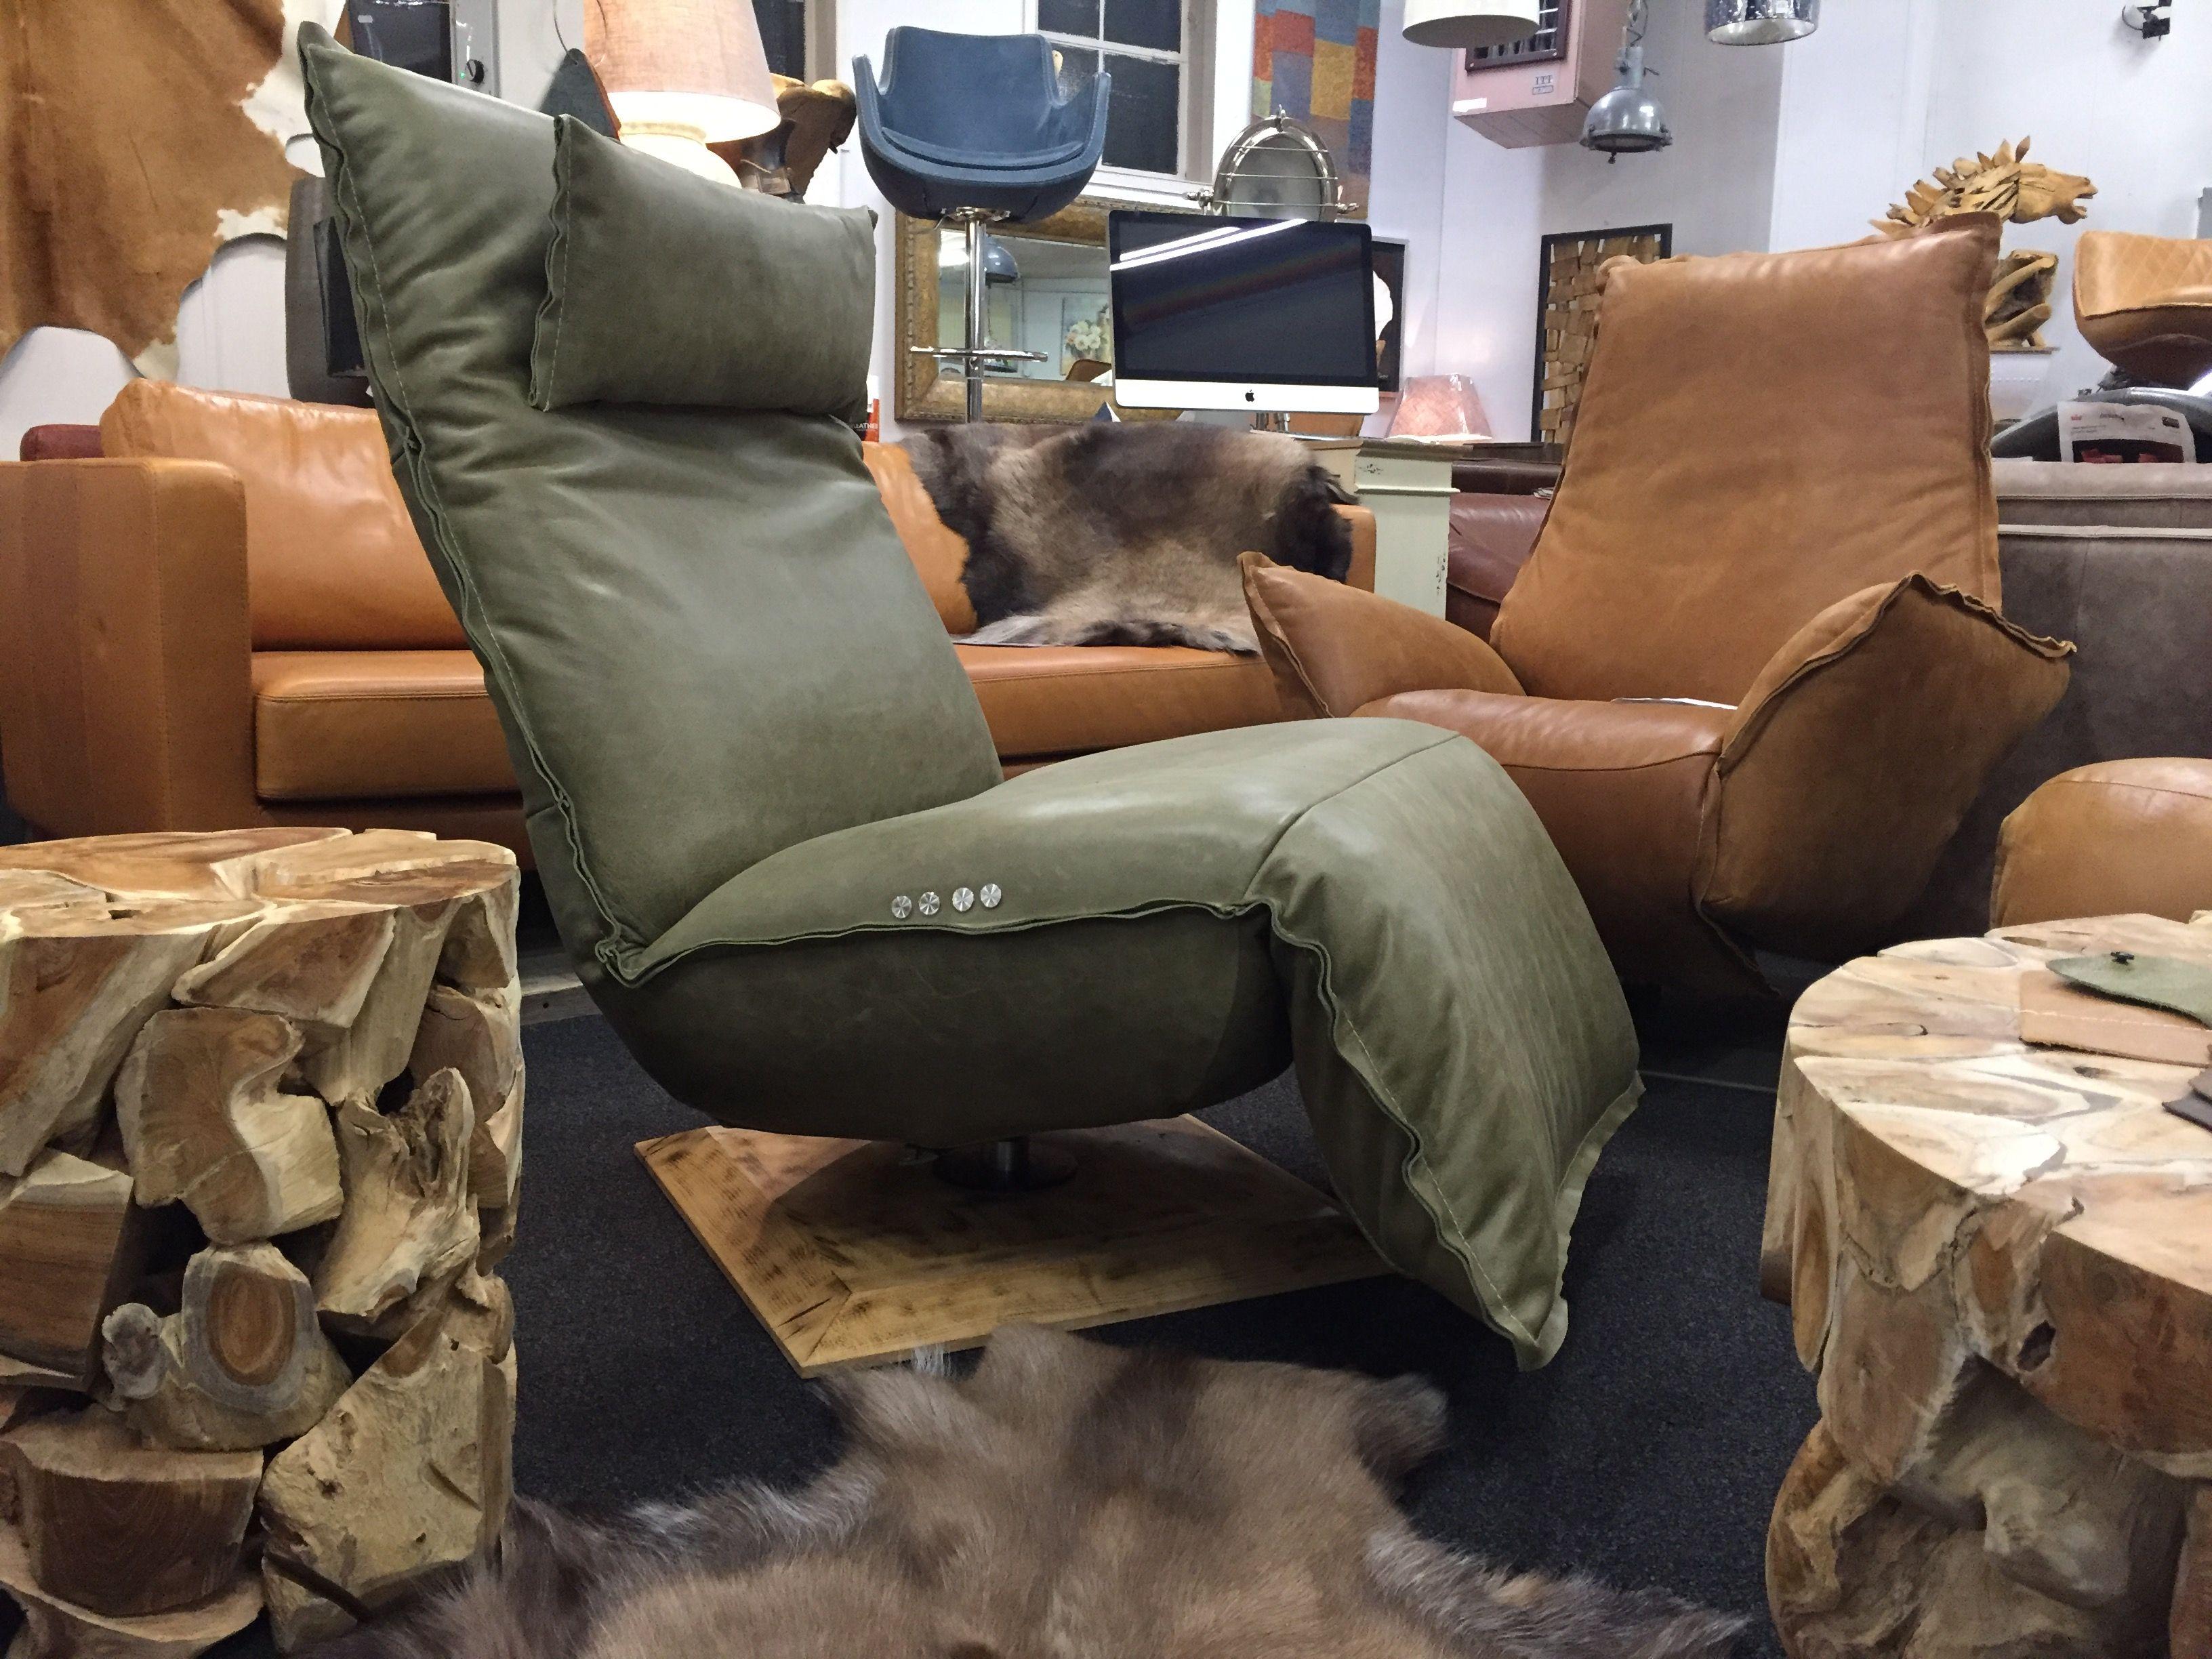 Lederen Elektrische Fauteuil.Enschede In 2019 Chill Relax Chairs Nl Fabrikaat Stoel